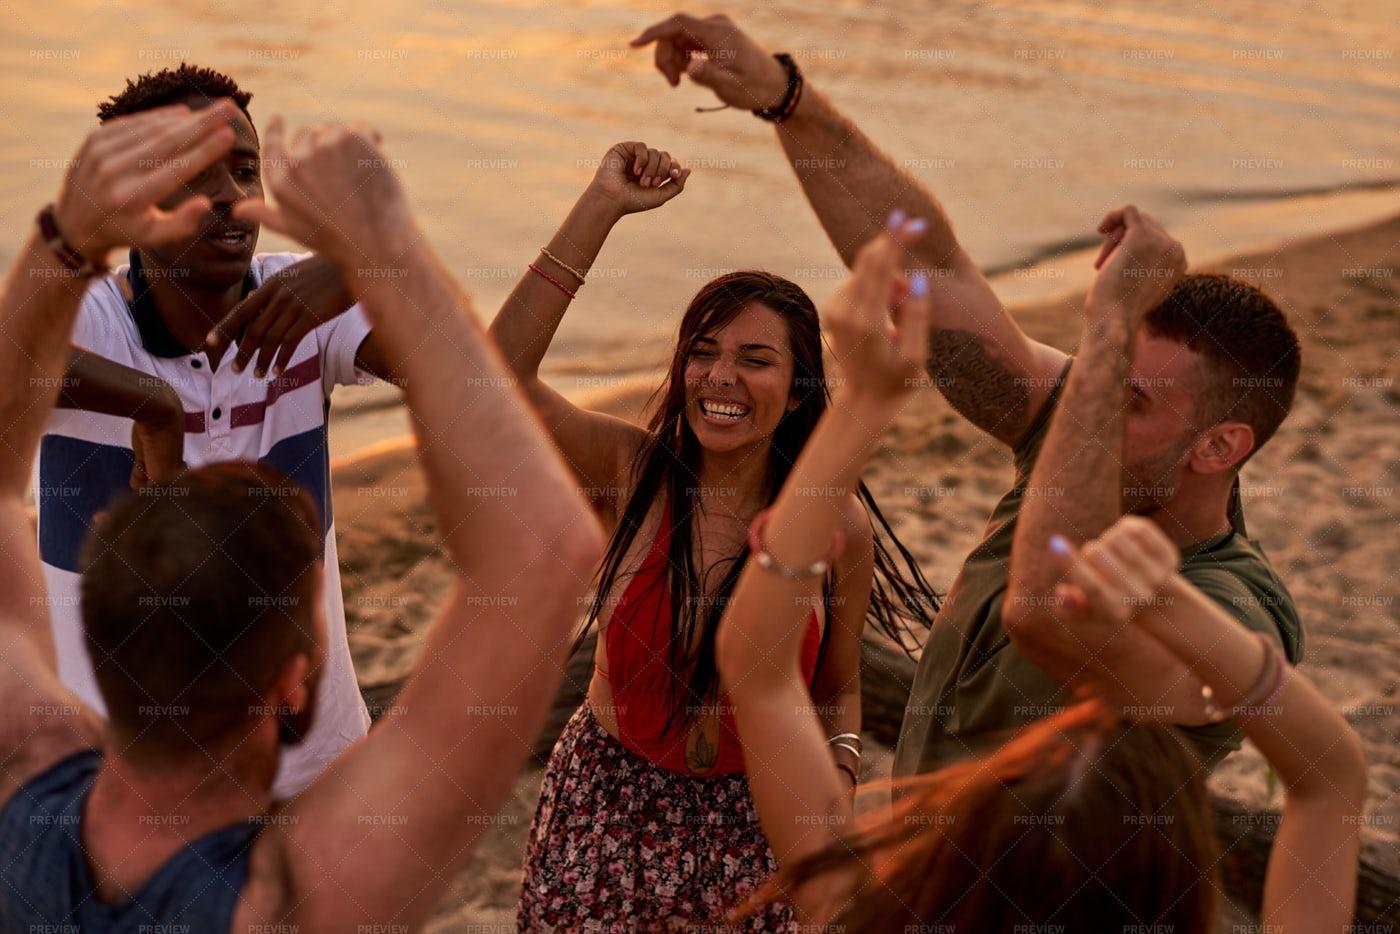 Interracial Friends Dancing In...: Stock Photos